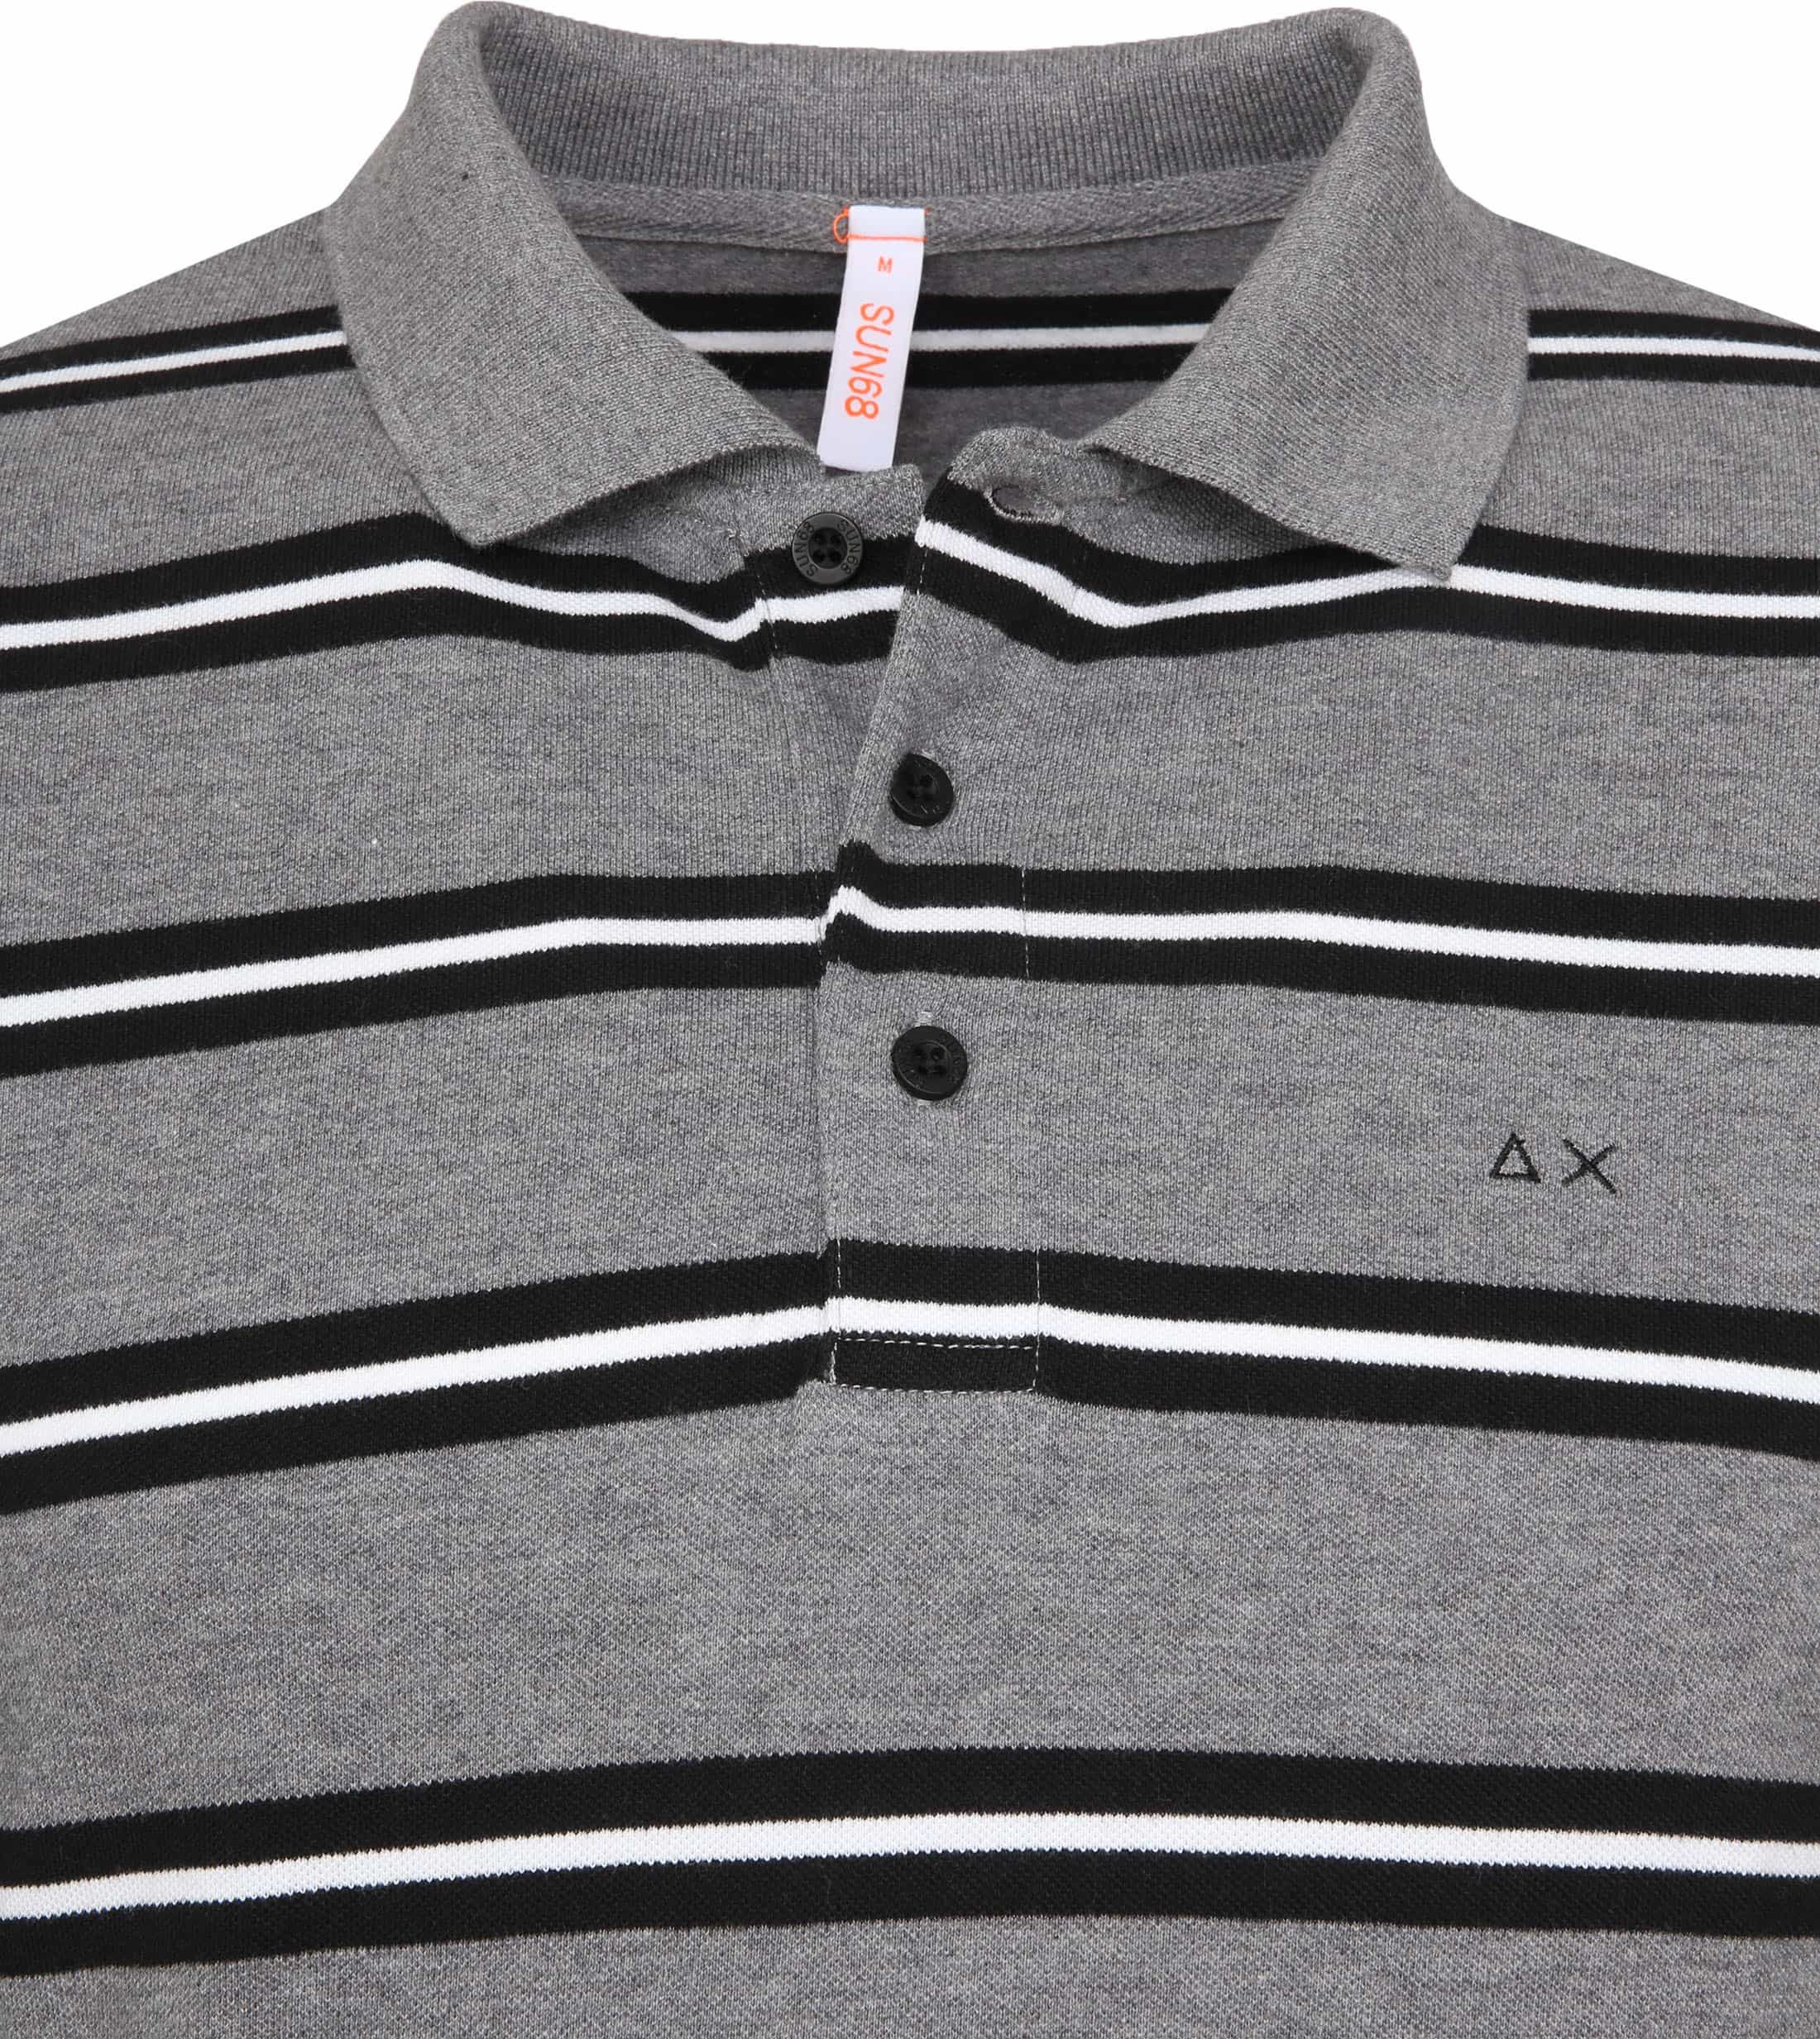 Sun68 Poloshirt LS Stripes Grey foto 1